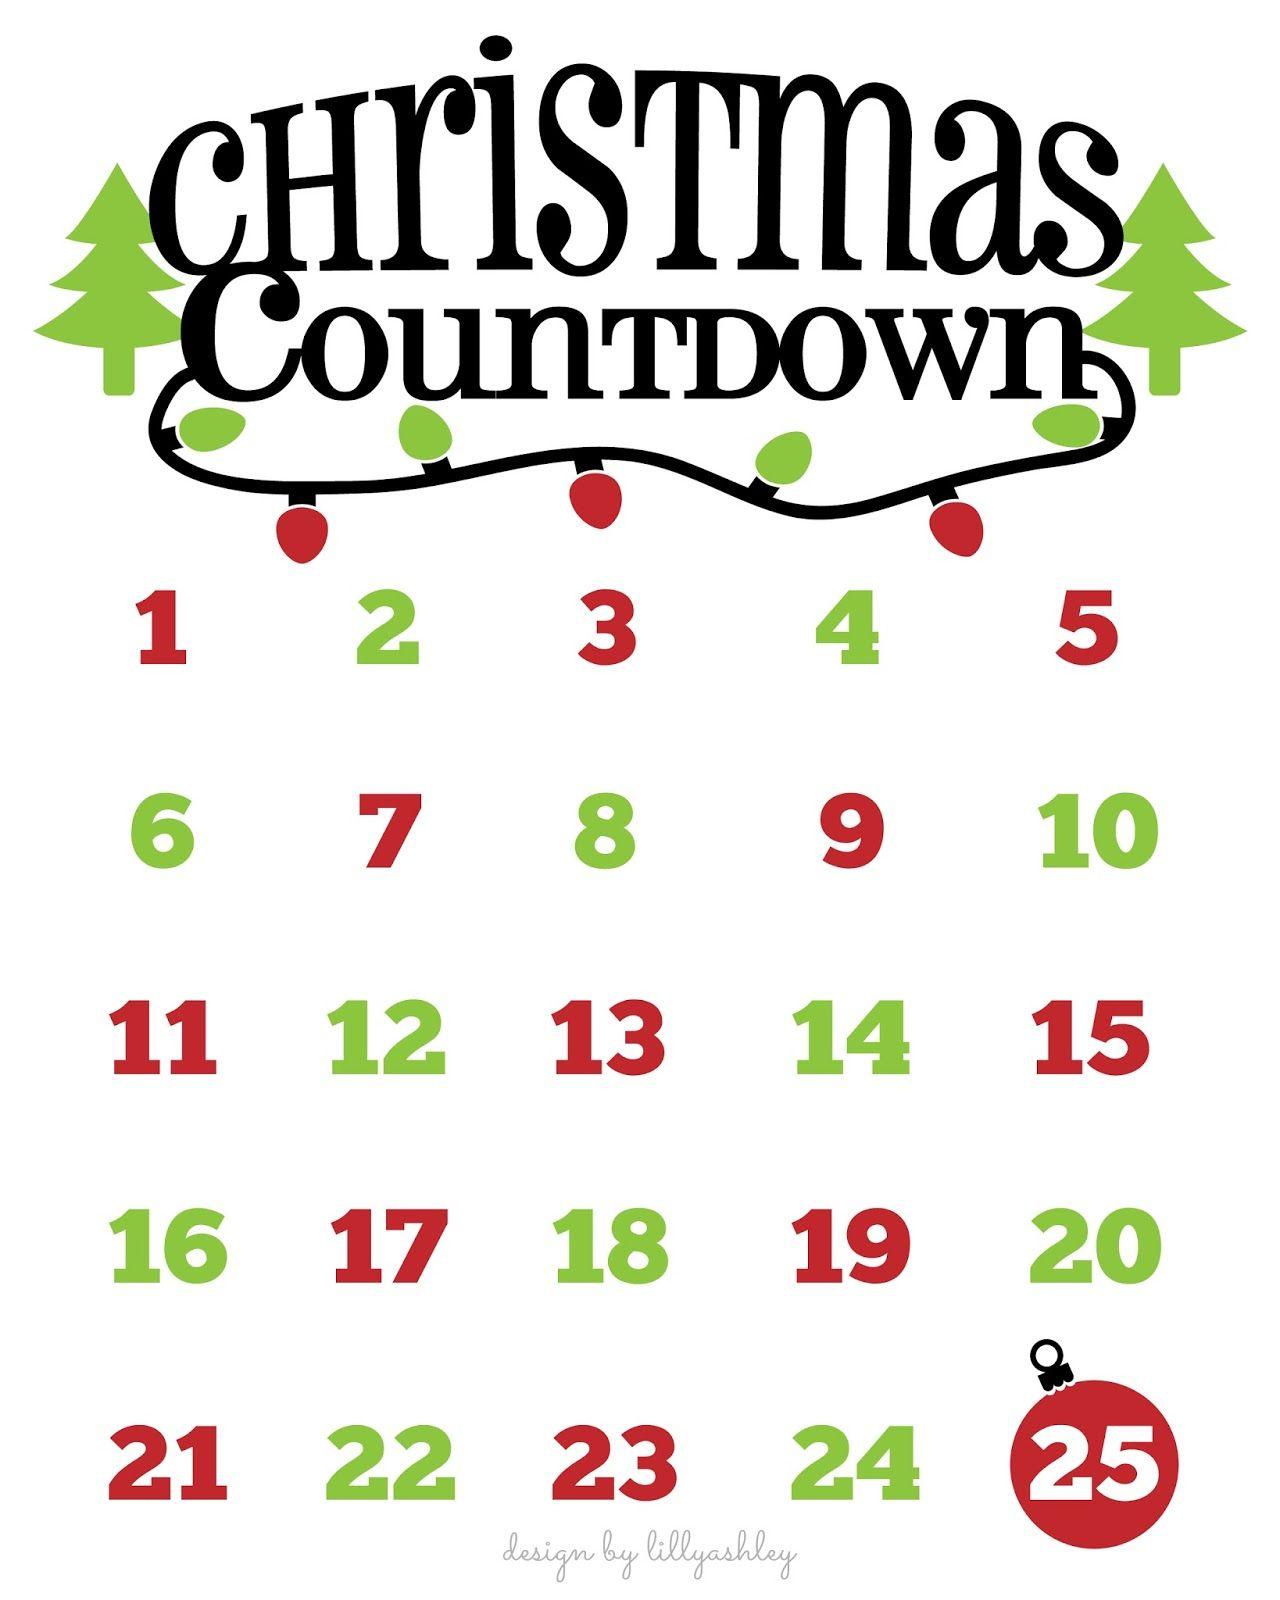 Pin on Christmas Gift Ideas 2020